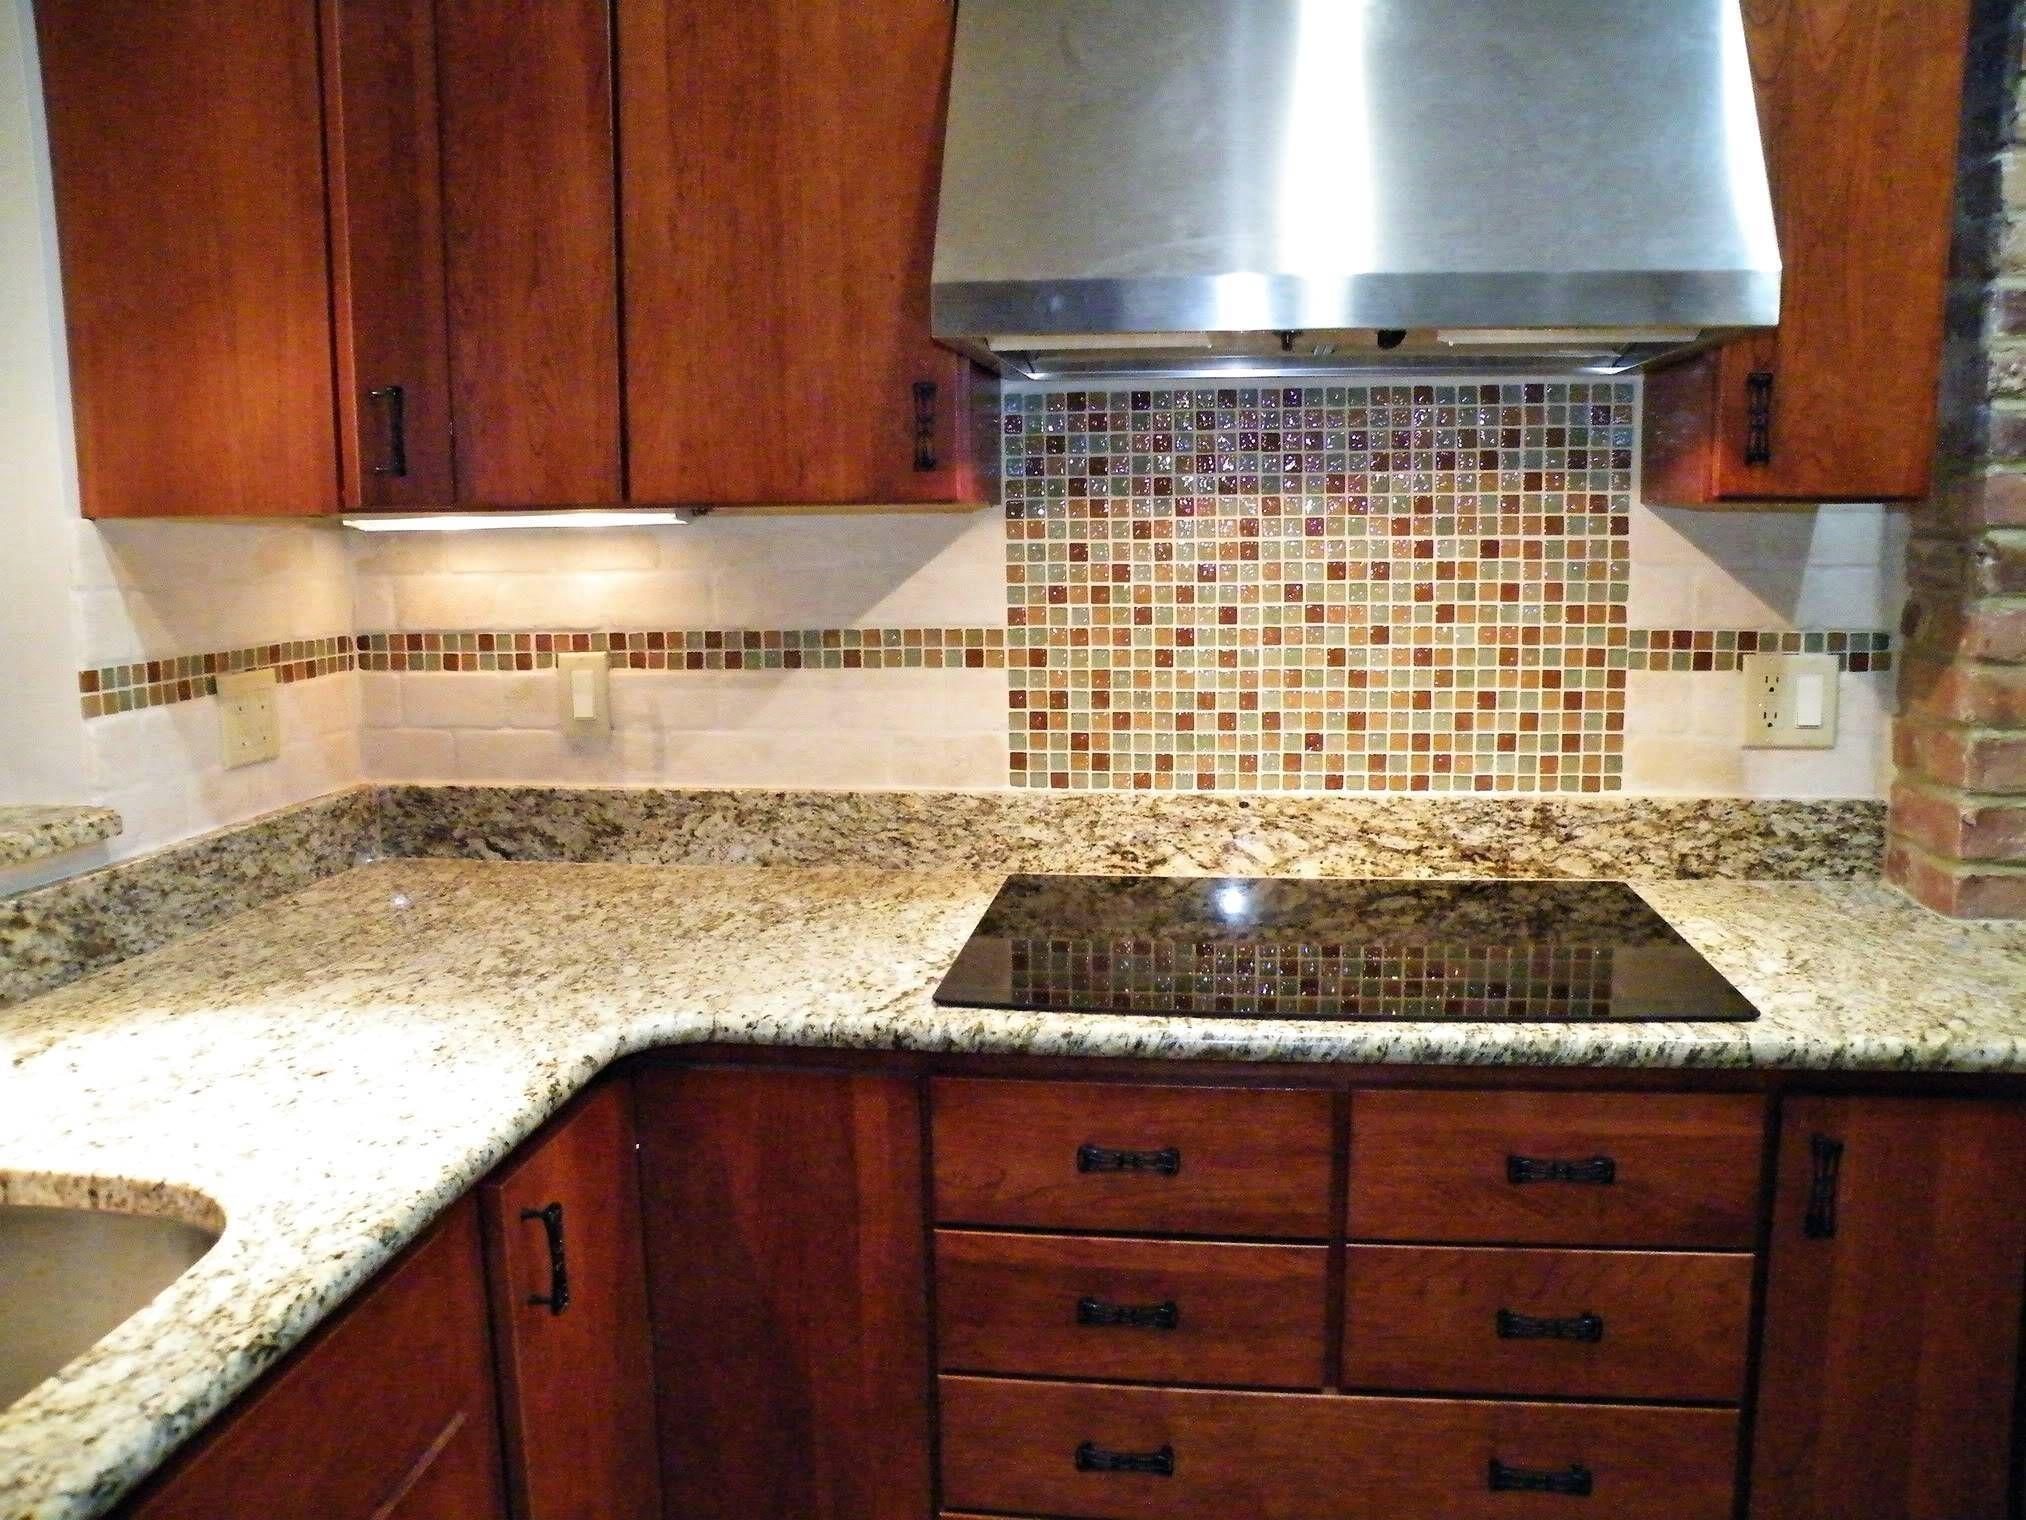 Kitchen backsplash tile ideas subway glass jubizfo